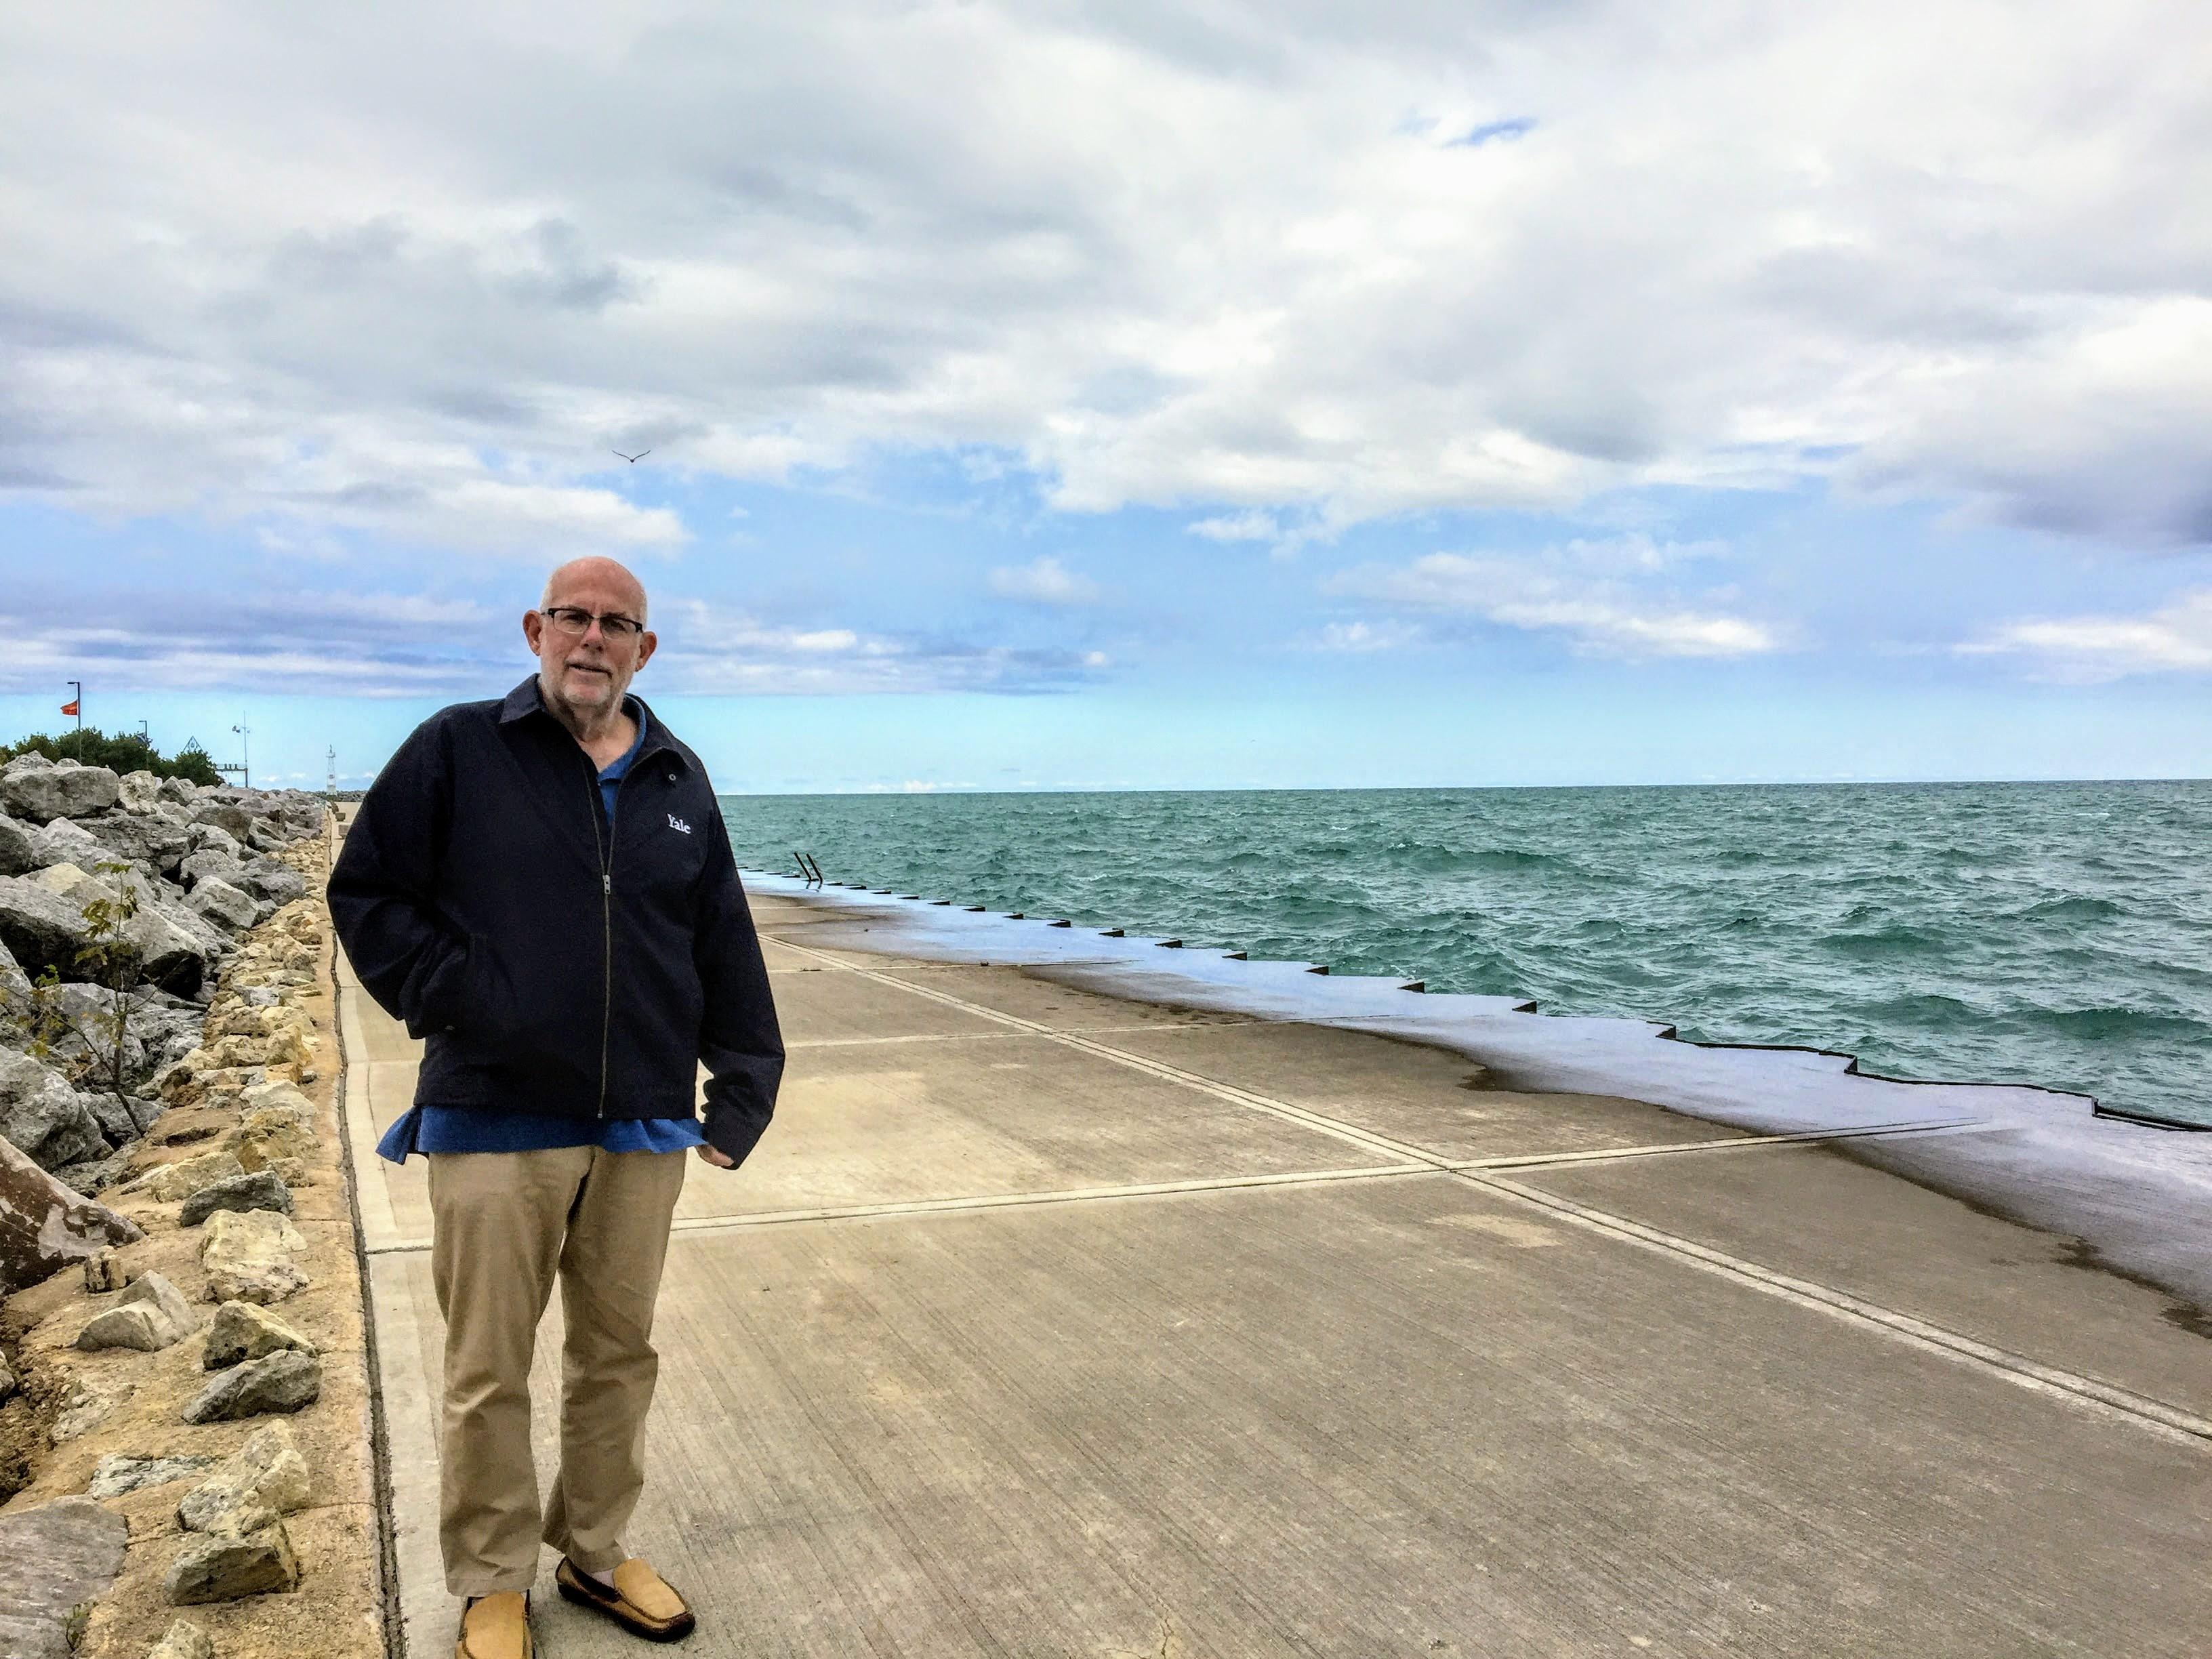 2017-09-08 Racine Lake Michigan 01